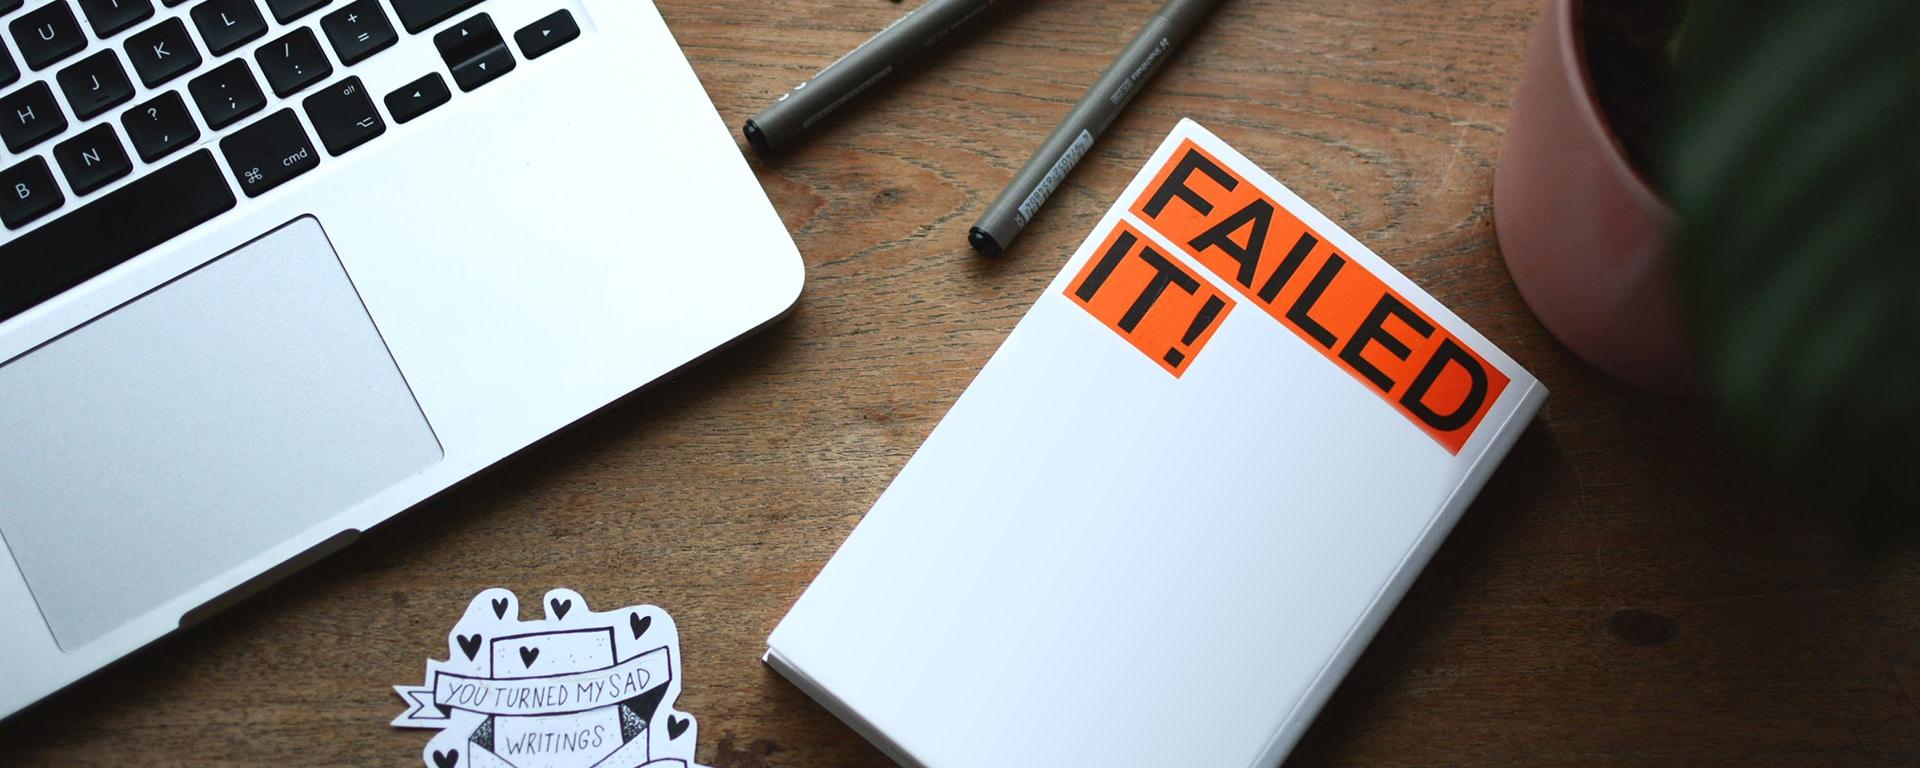 Failed it! Book